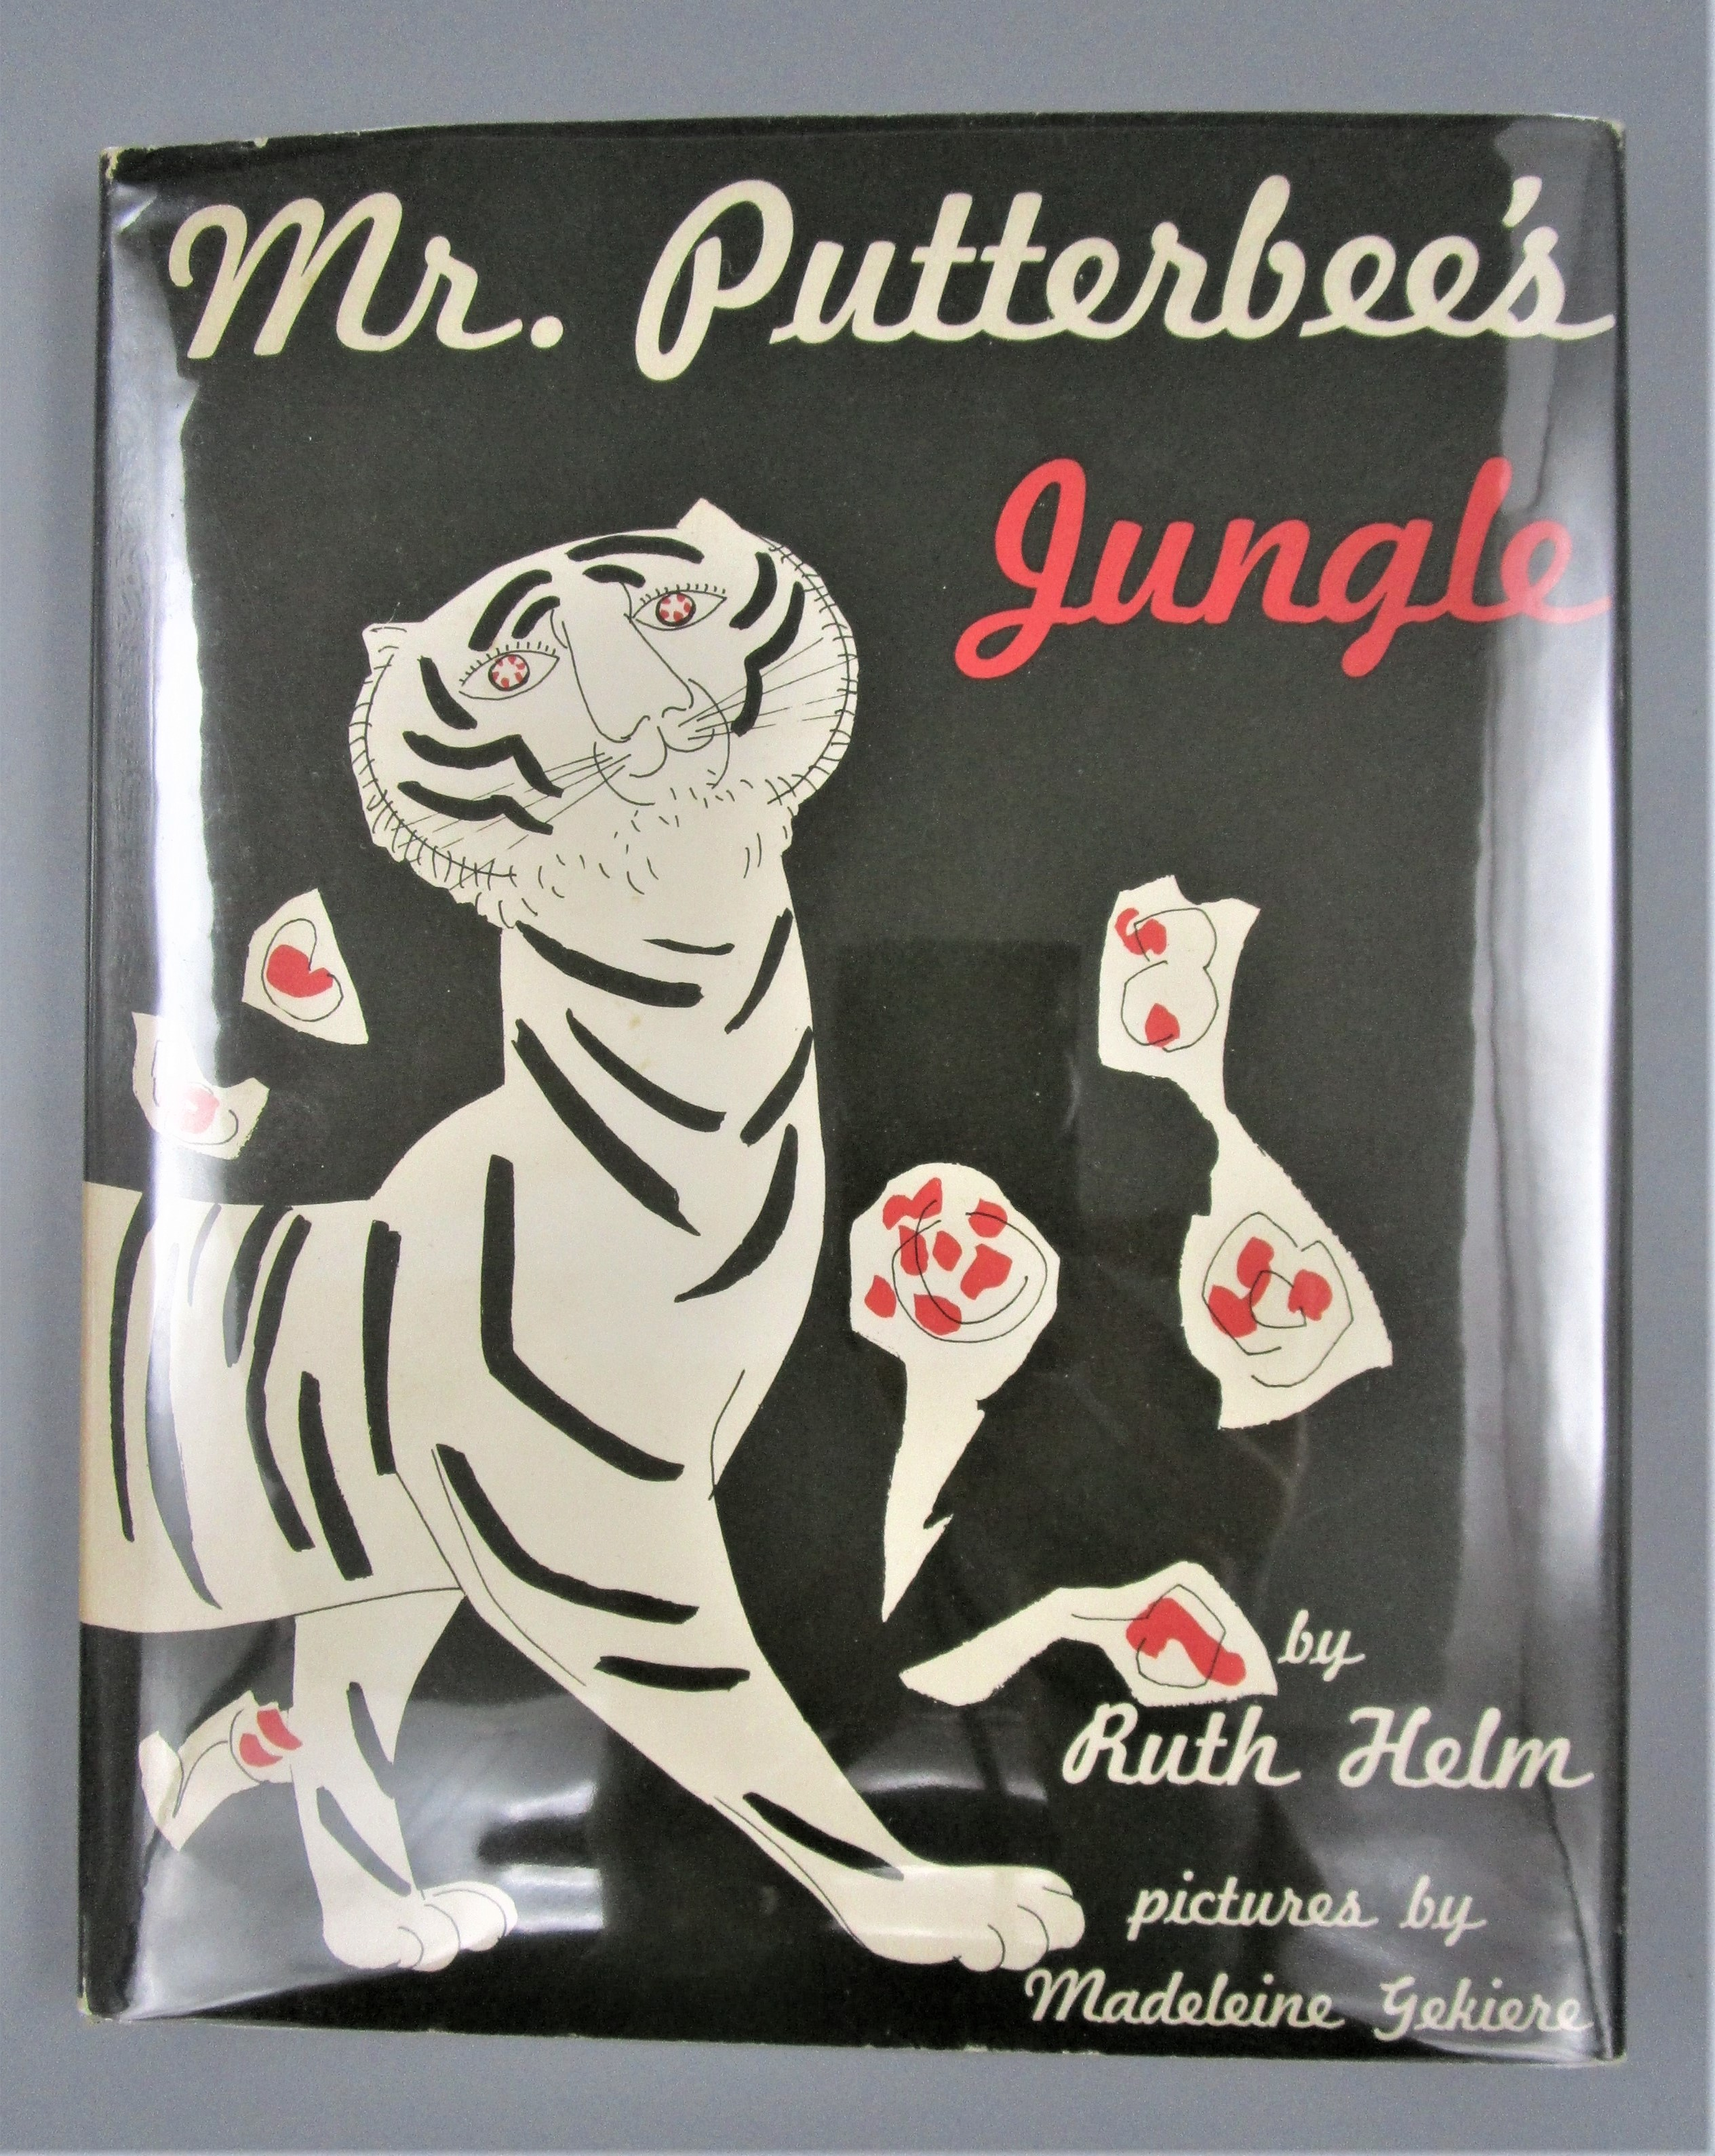 MR. PUTTERBEE'S JUNGLE, by Ruth Helm & Madeleine Gekiere - 1953 [1st Ed]